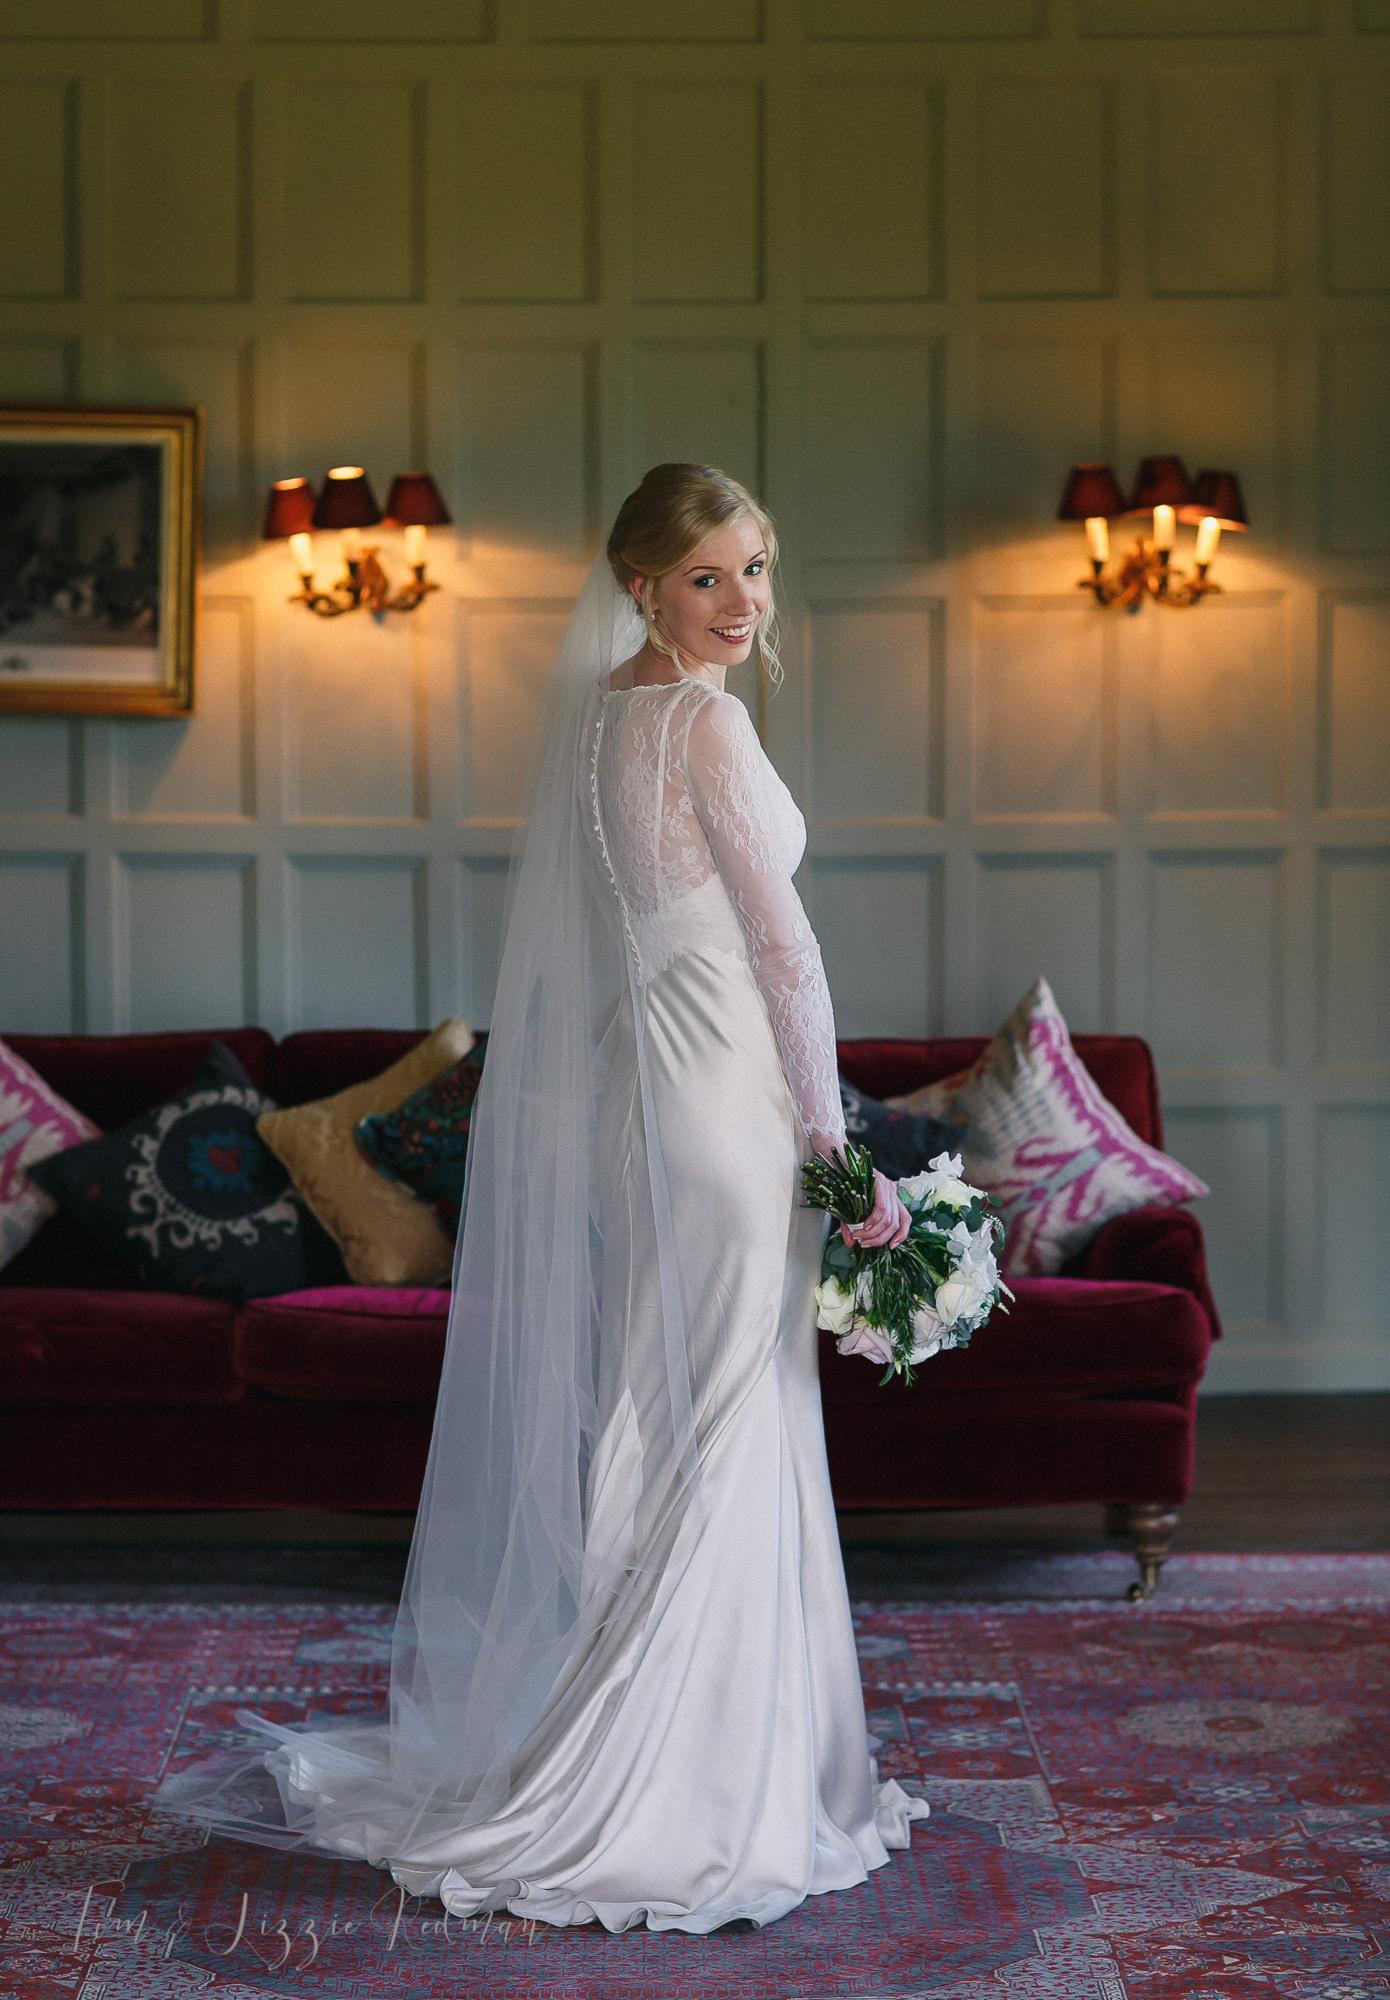 Dorset wedding photographers Tom & Lizzie Redman 045.jpg